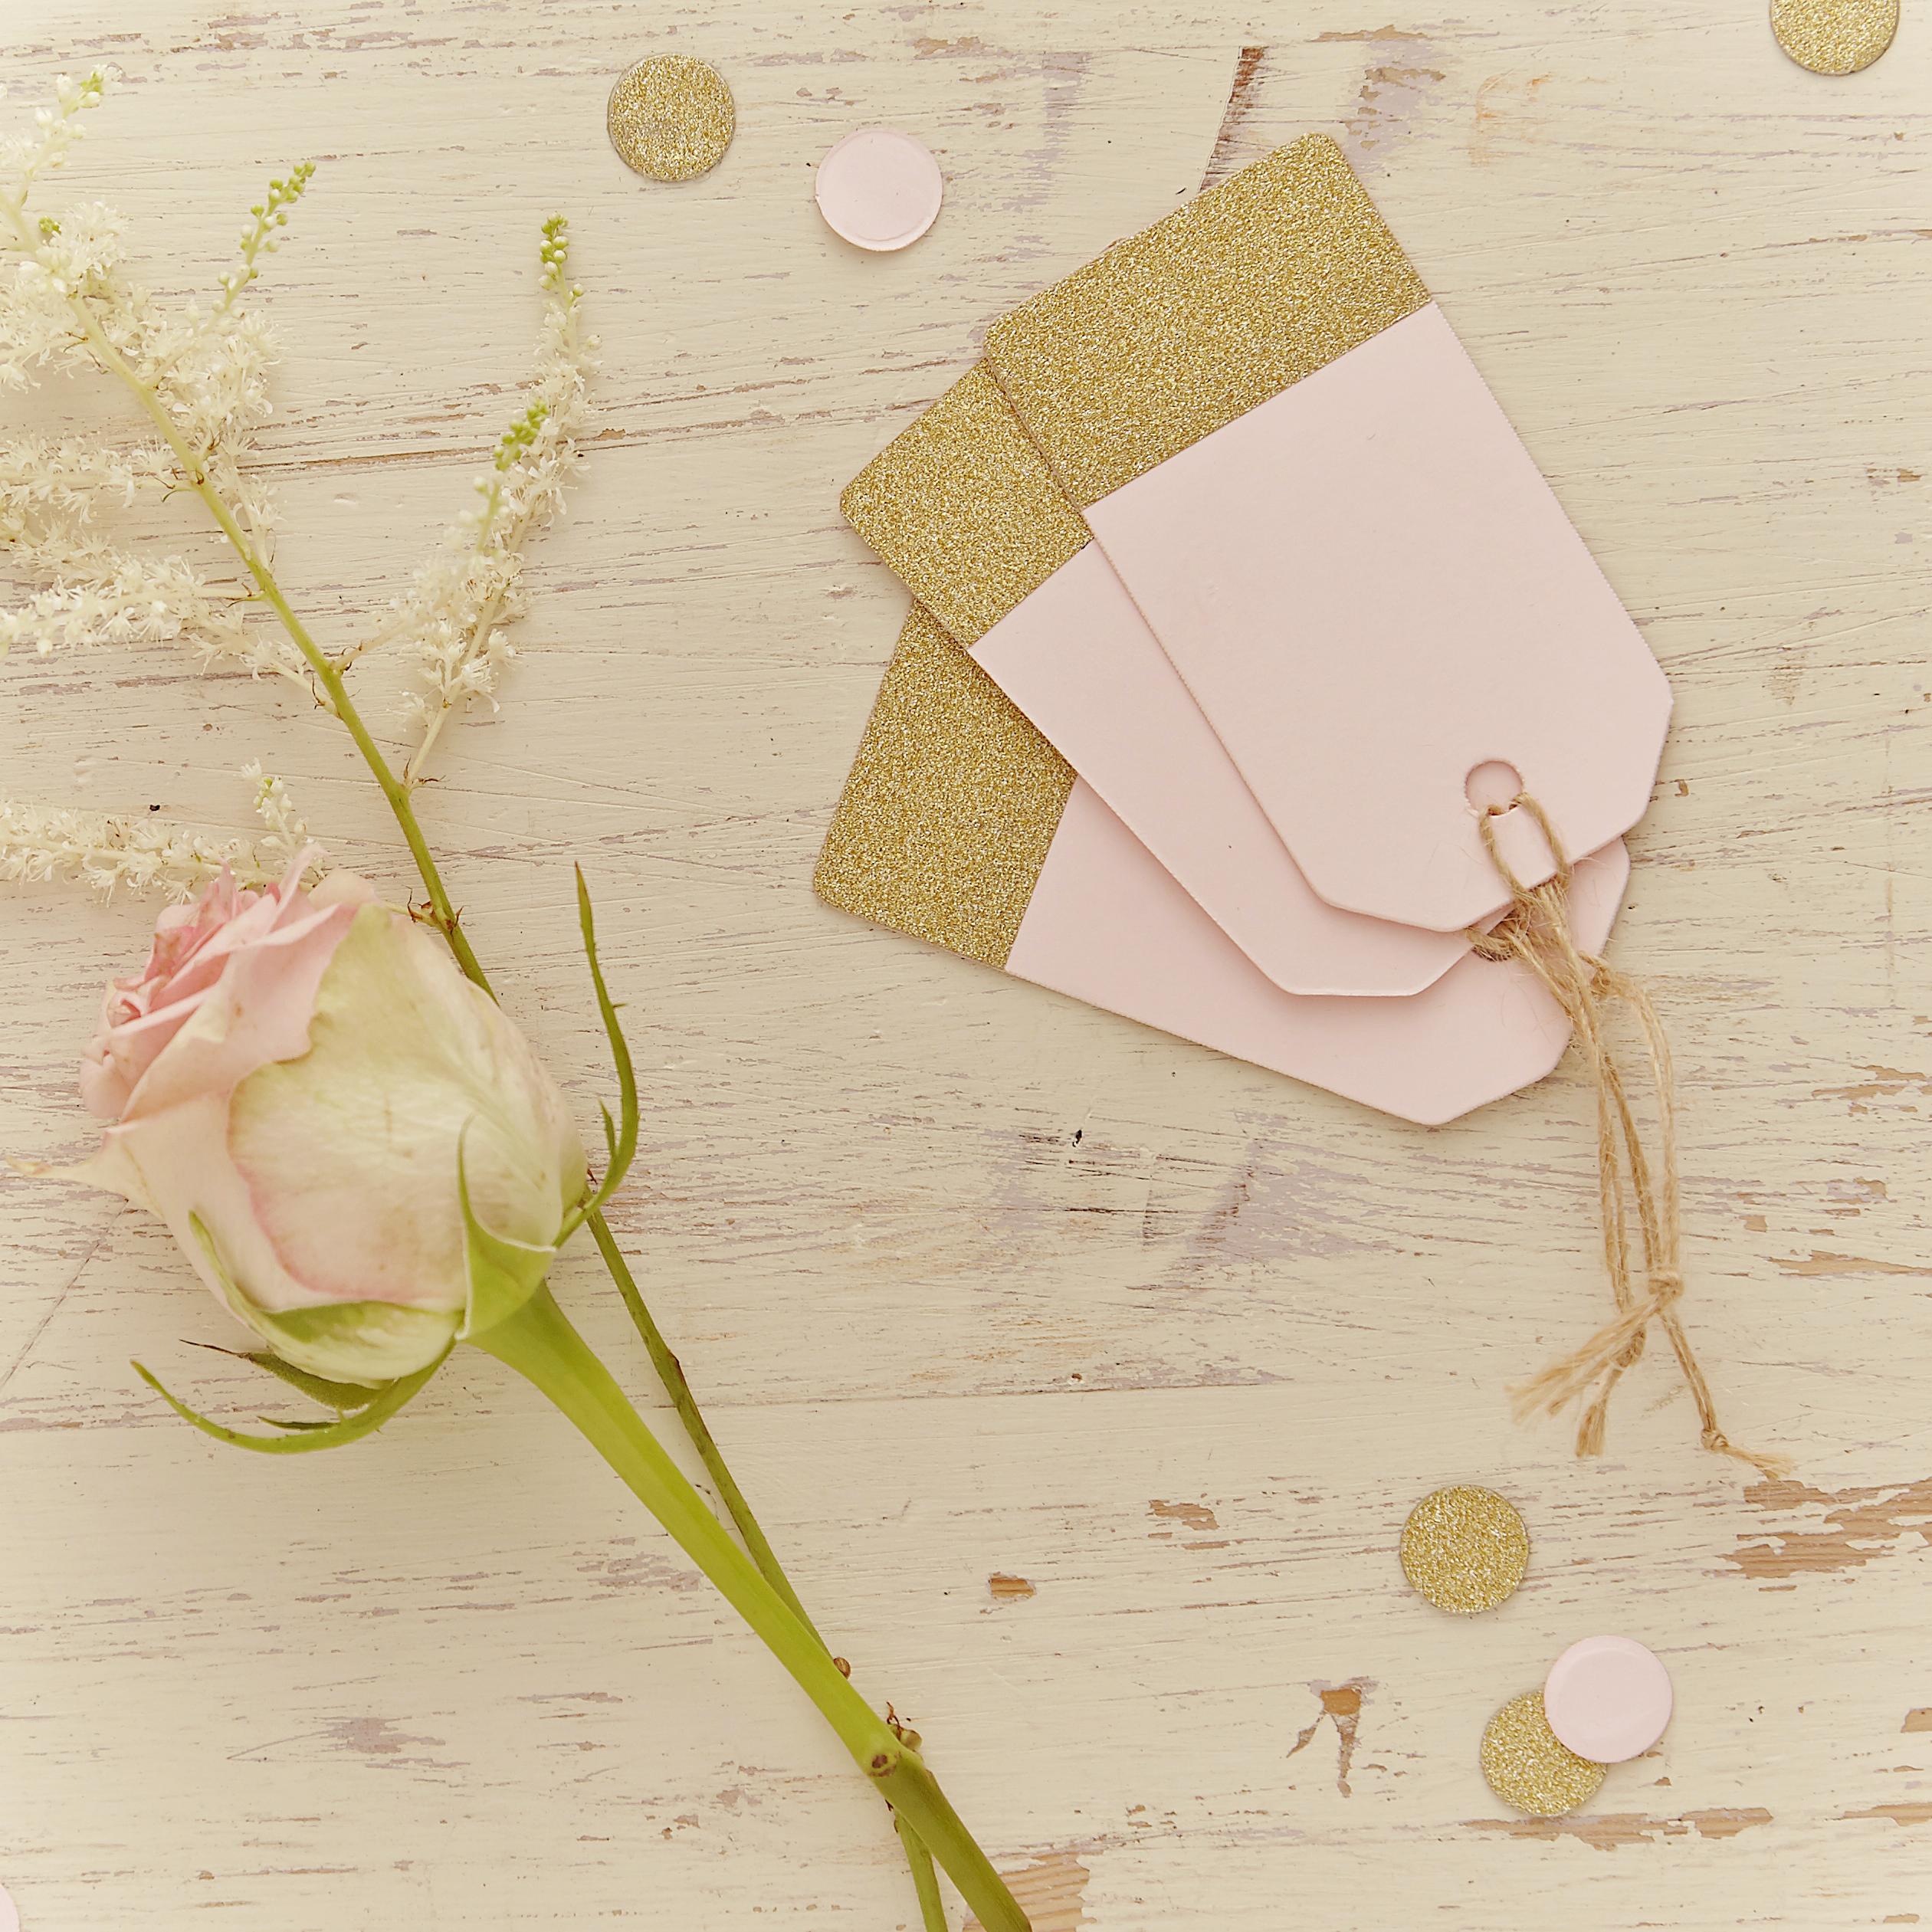 Oui Oui-Etiquetas dorado y rosa 1